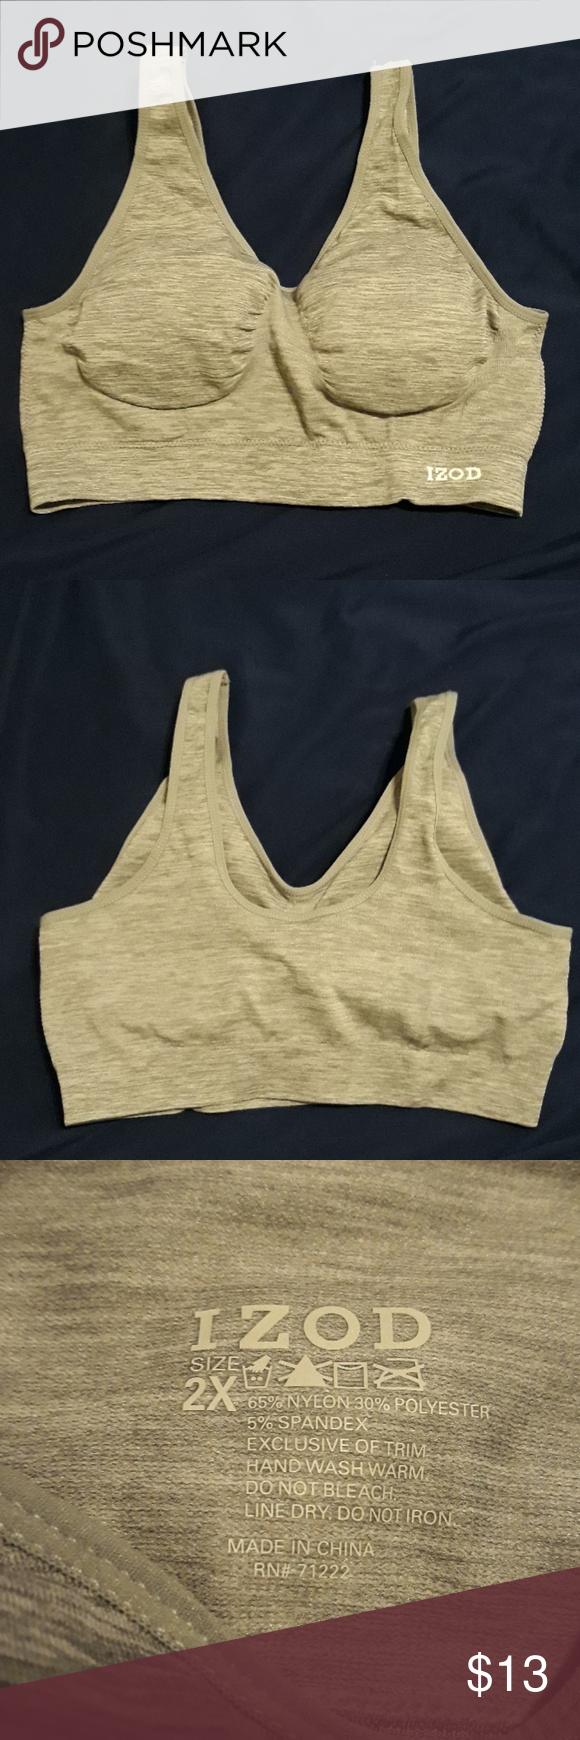 b34c24f71ea74 Izod Bra Izod Bra Size 2X Padding in the bra and no wire. Color  Gray NWOT  Offers Welcome  ) Izod Intimates   Sleepwear Bras